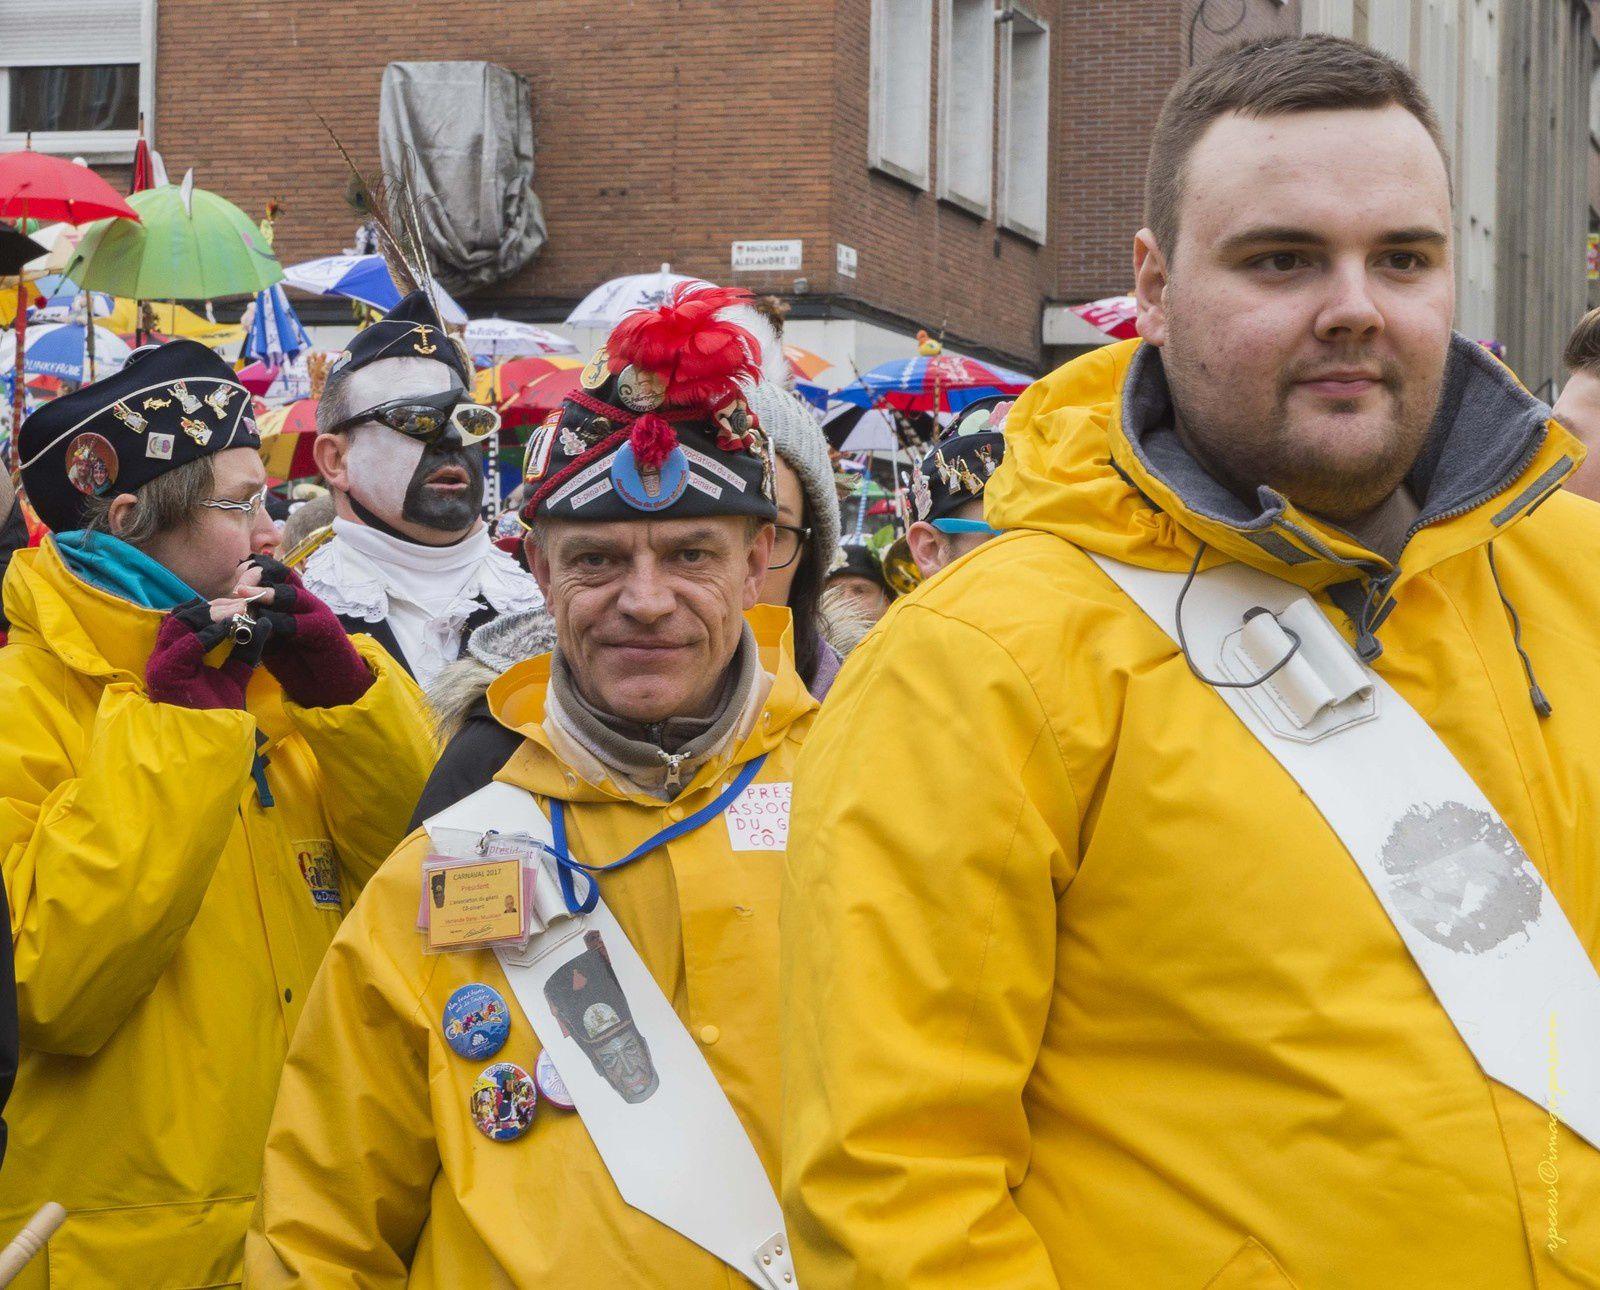 La Visschersbende Bande de Dunkerque 2017